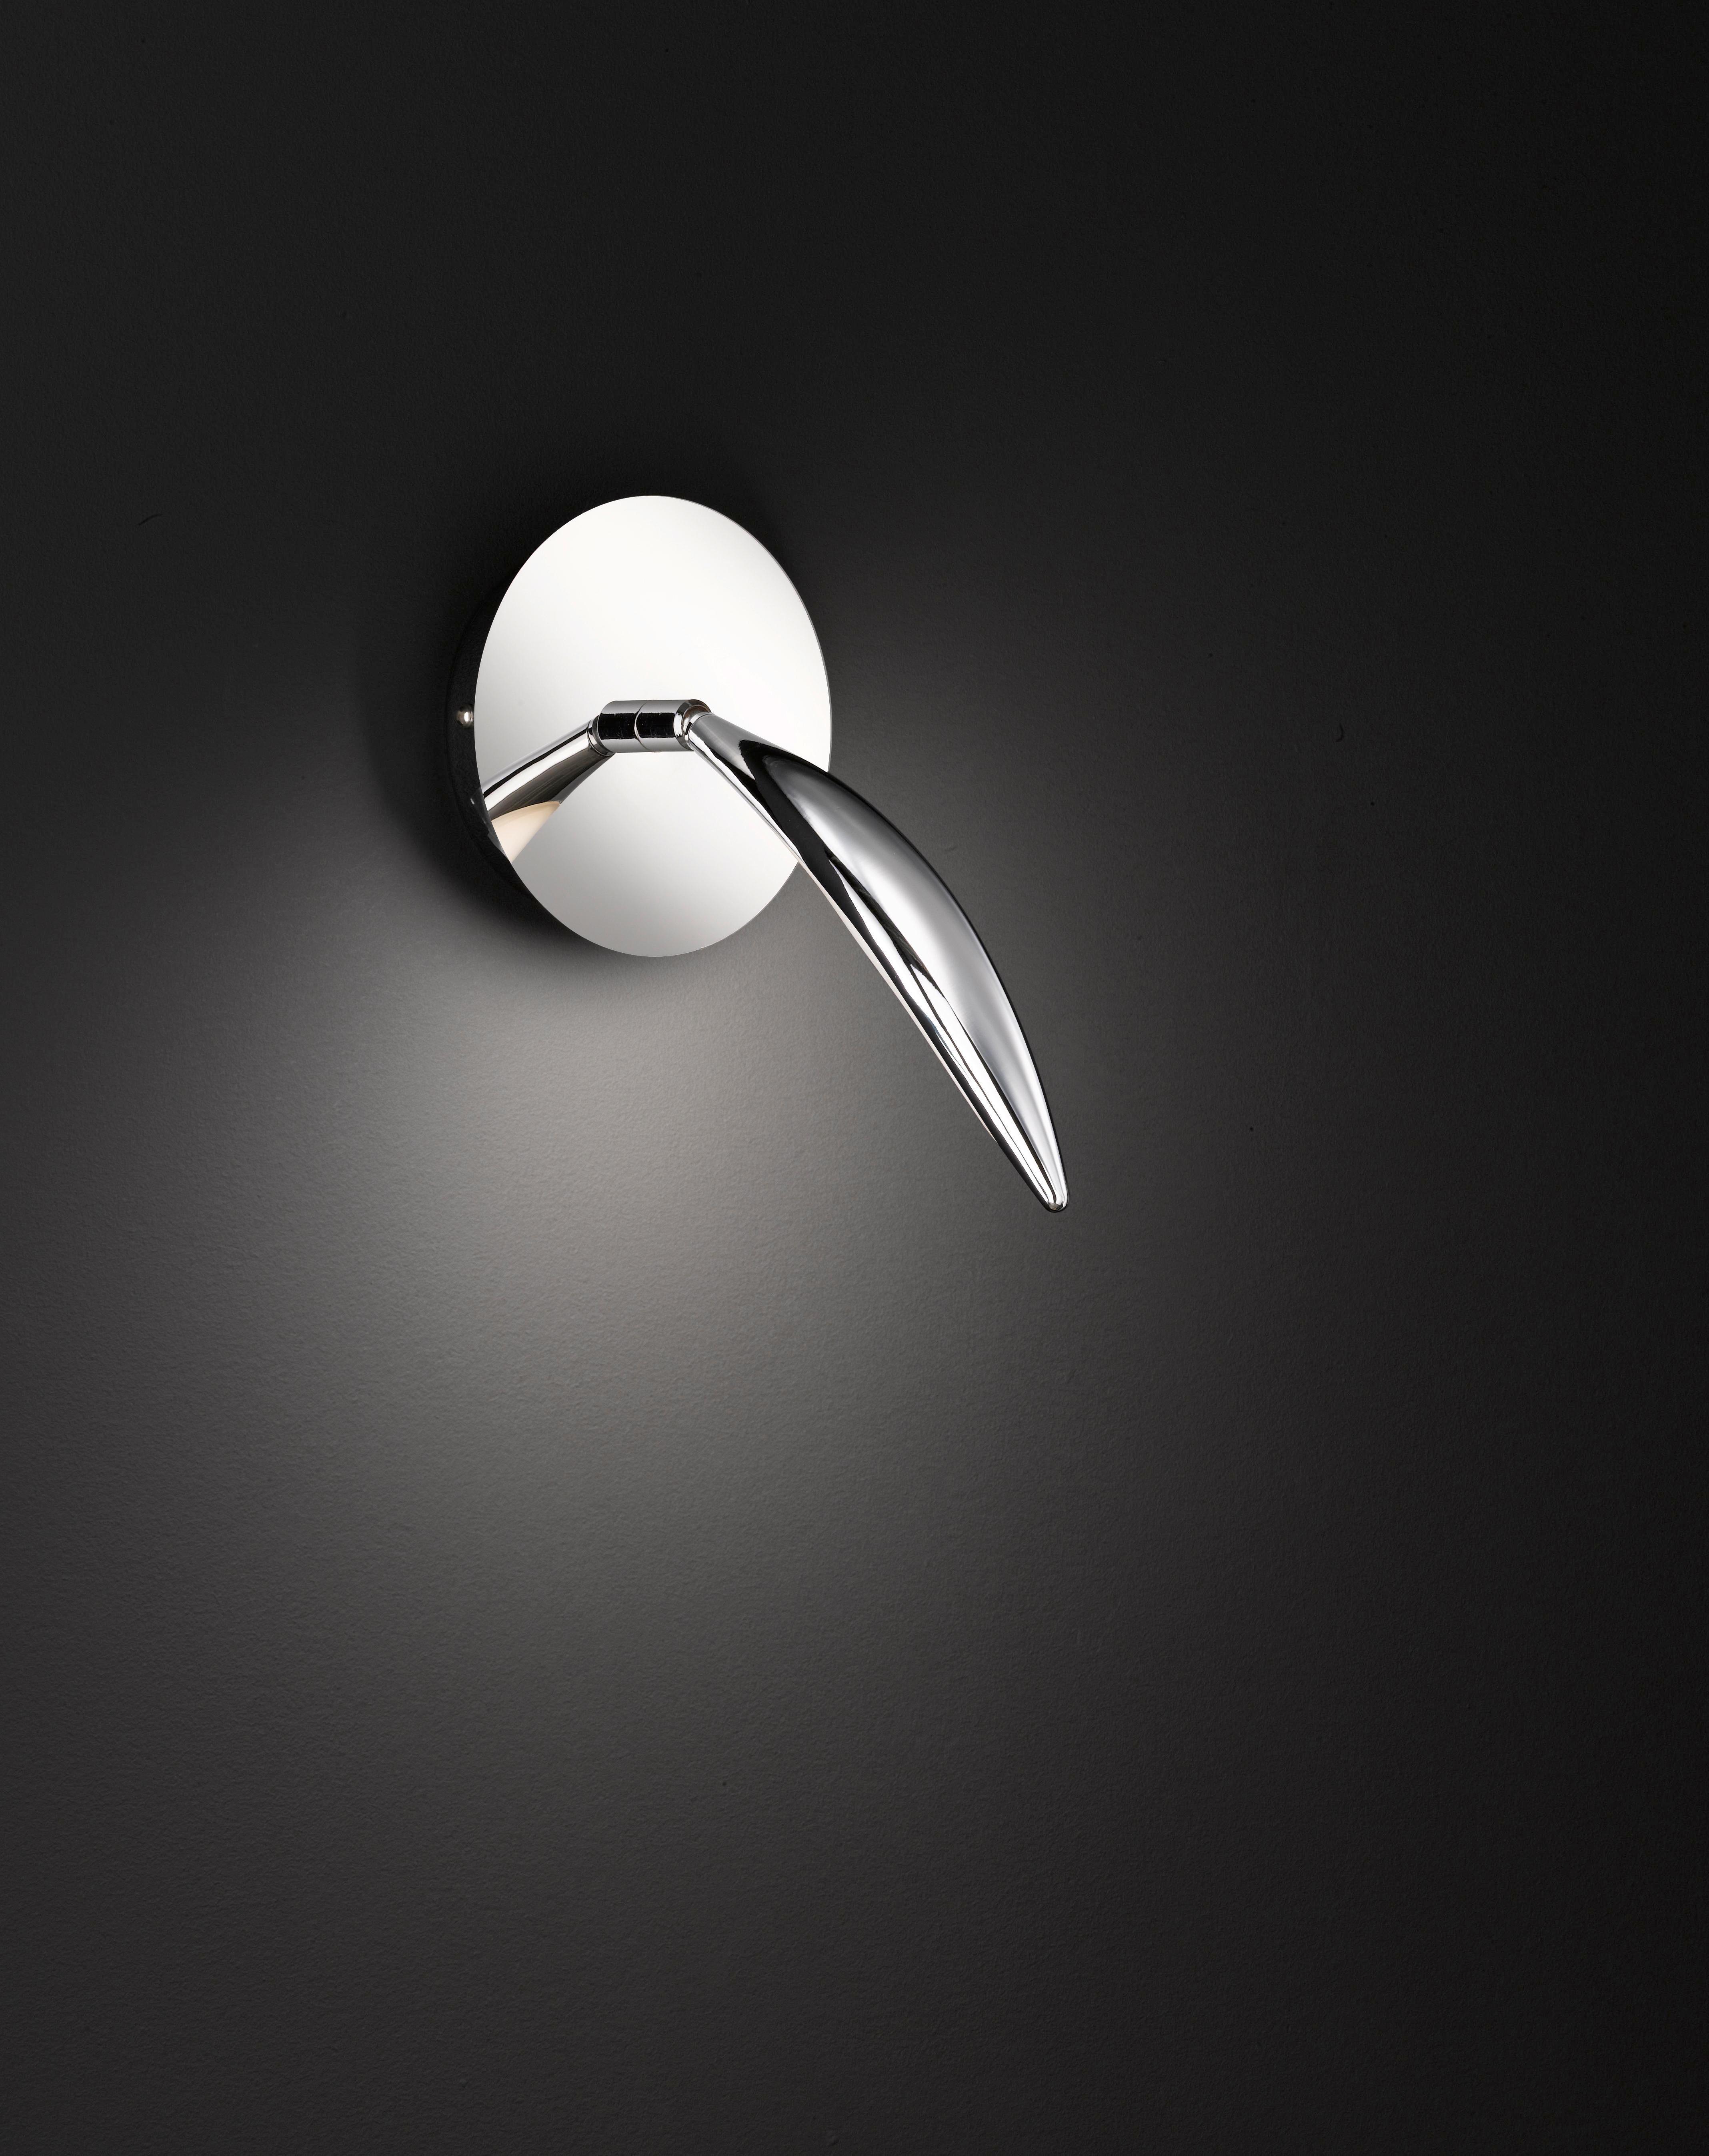 LED-WANDLEUCHTE - Chromfarben, Design, Metall (14/14/25,5cm)